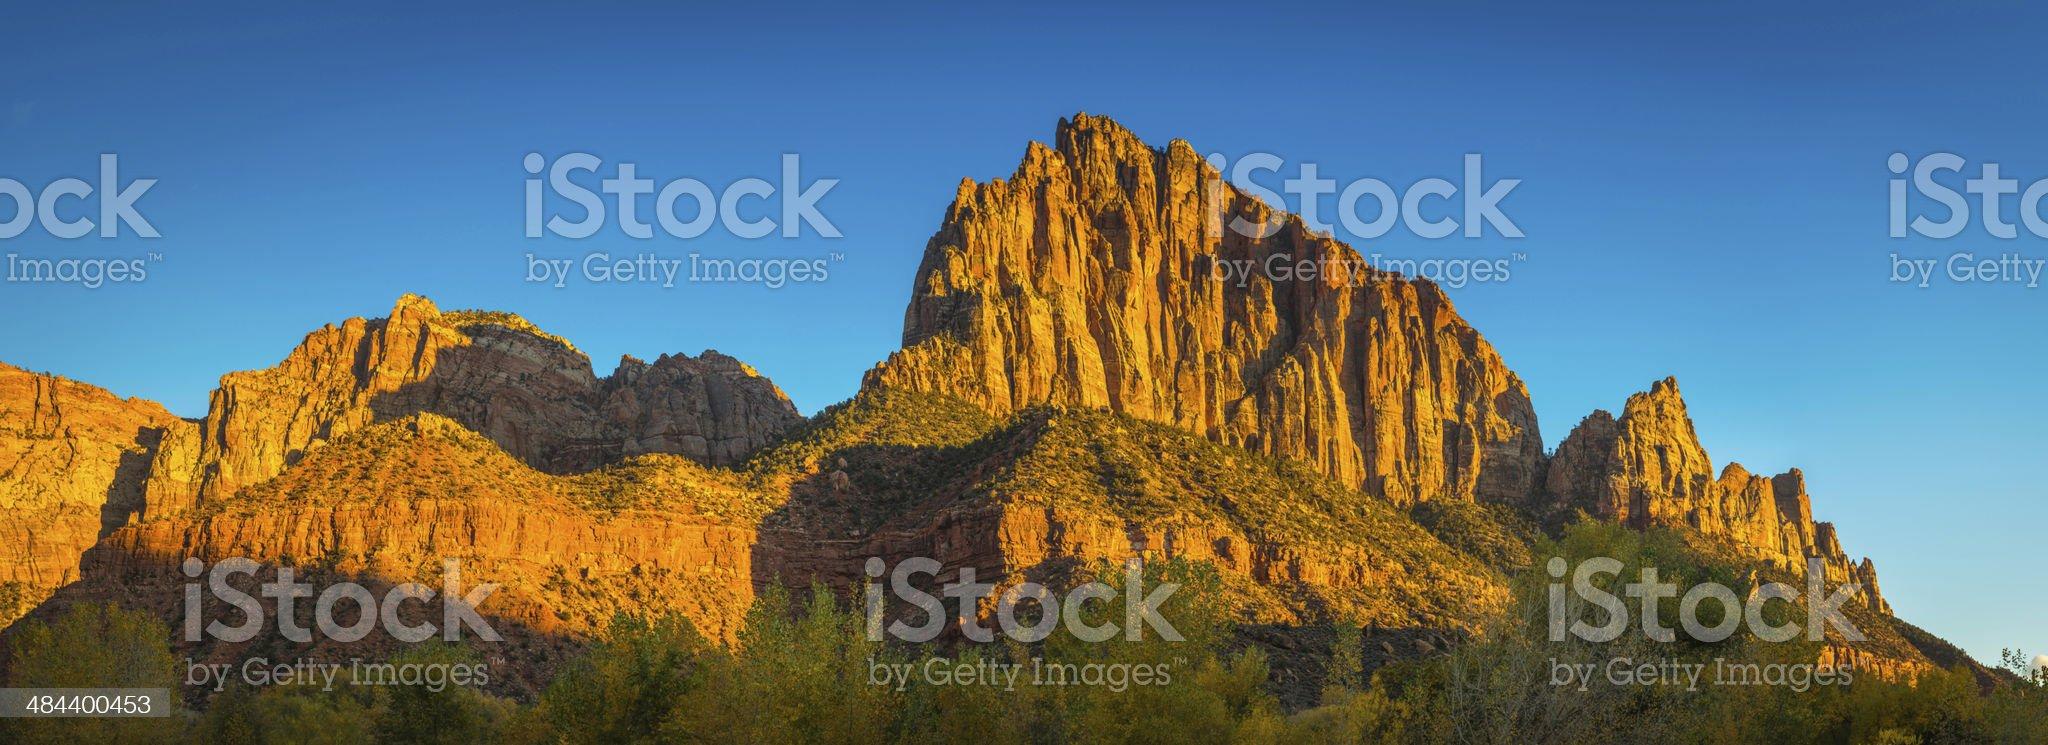 Golden peaks desert rock formation panorama Zion National Park Utah royalty-free stock photo